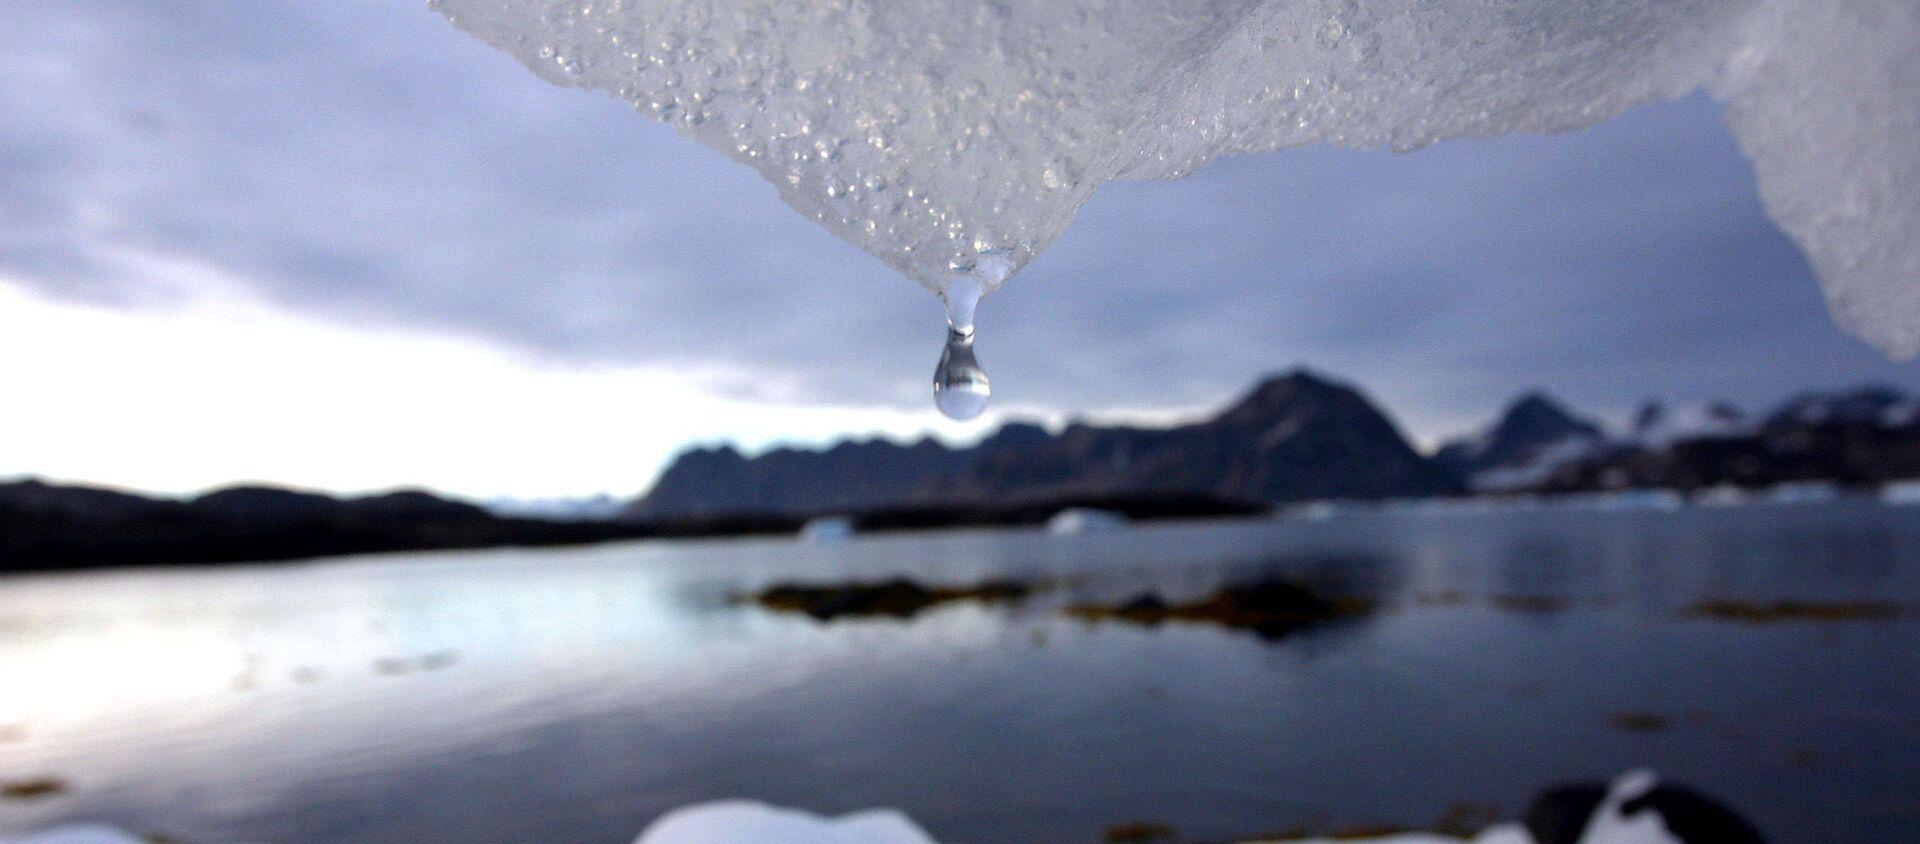 Тающие ледники Гренландии - Sputnik Latvija, 1920, 21.11.2020